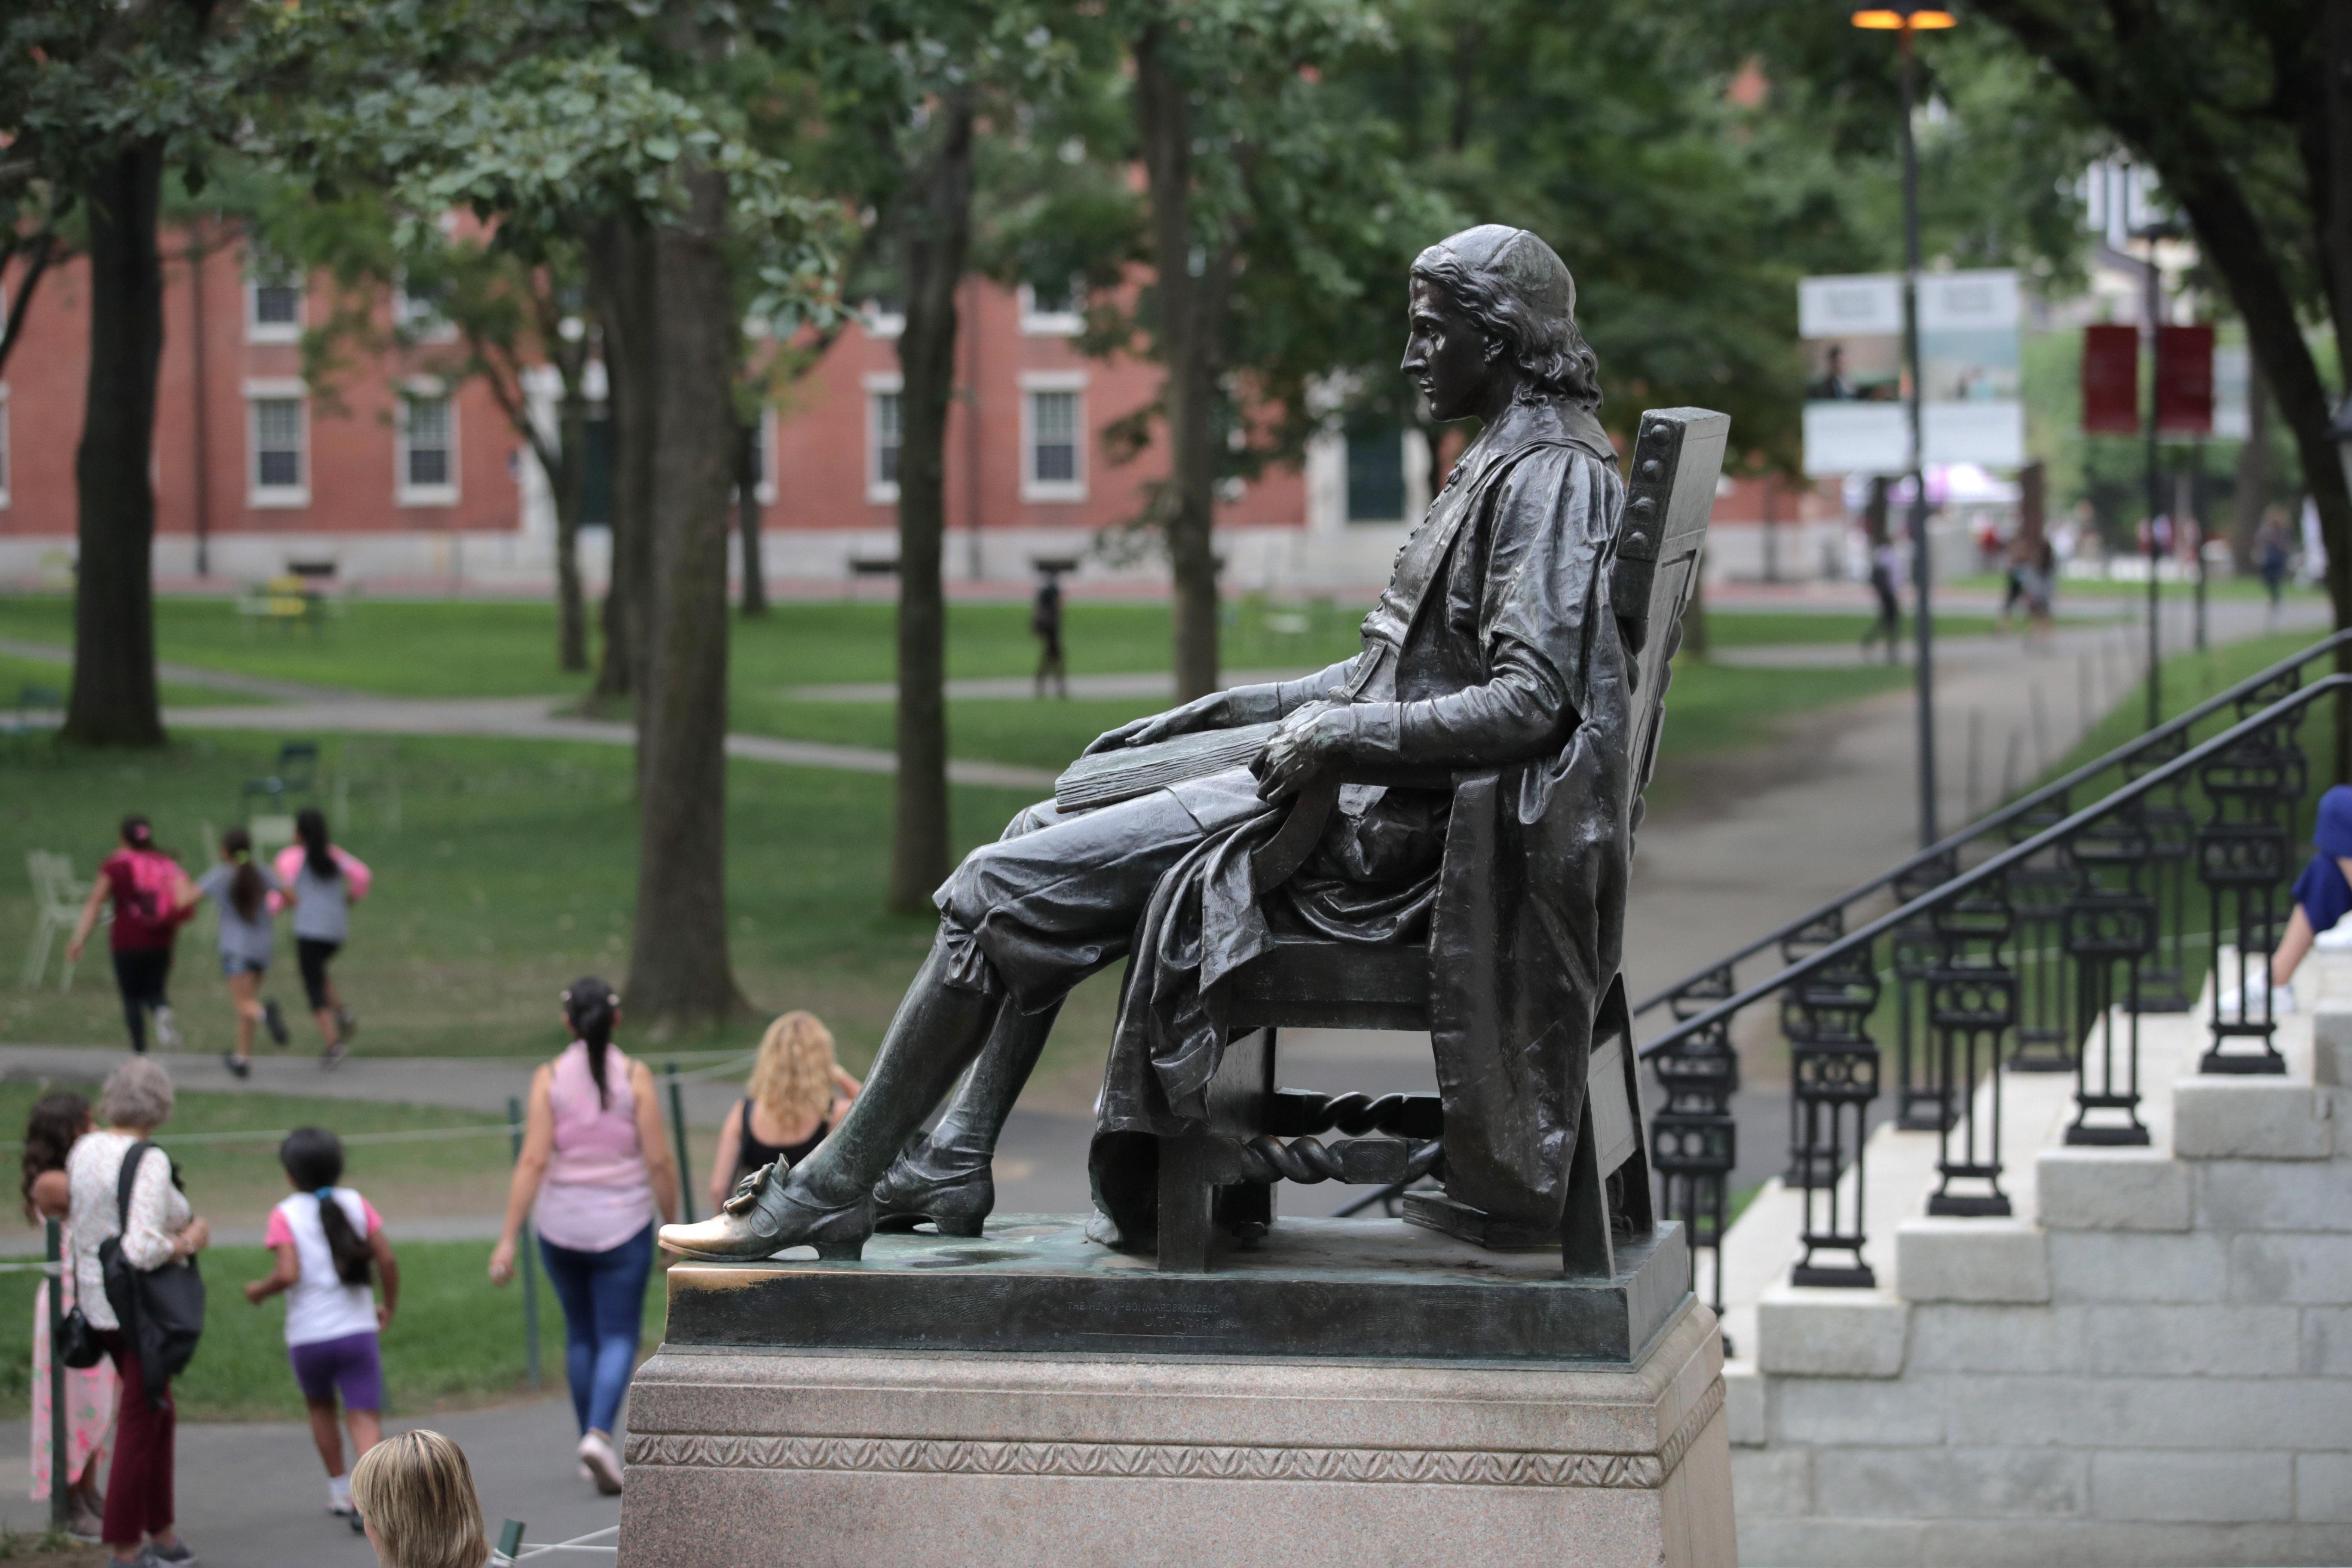 The statue of John Harvard sits in Harvard Yard at Harvard University in Cambridge, Mass., on Aug. 13, 2019. (AP Photo/Charles Krupa)